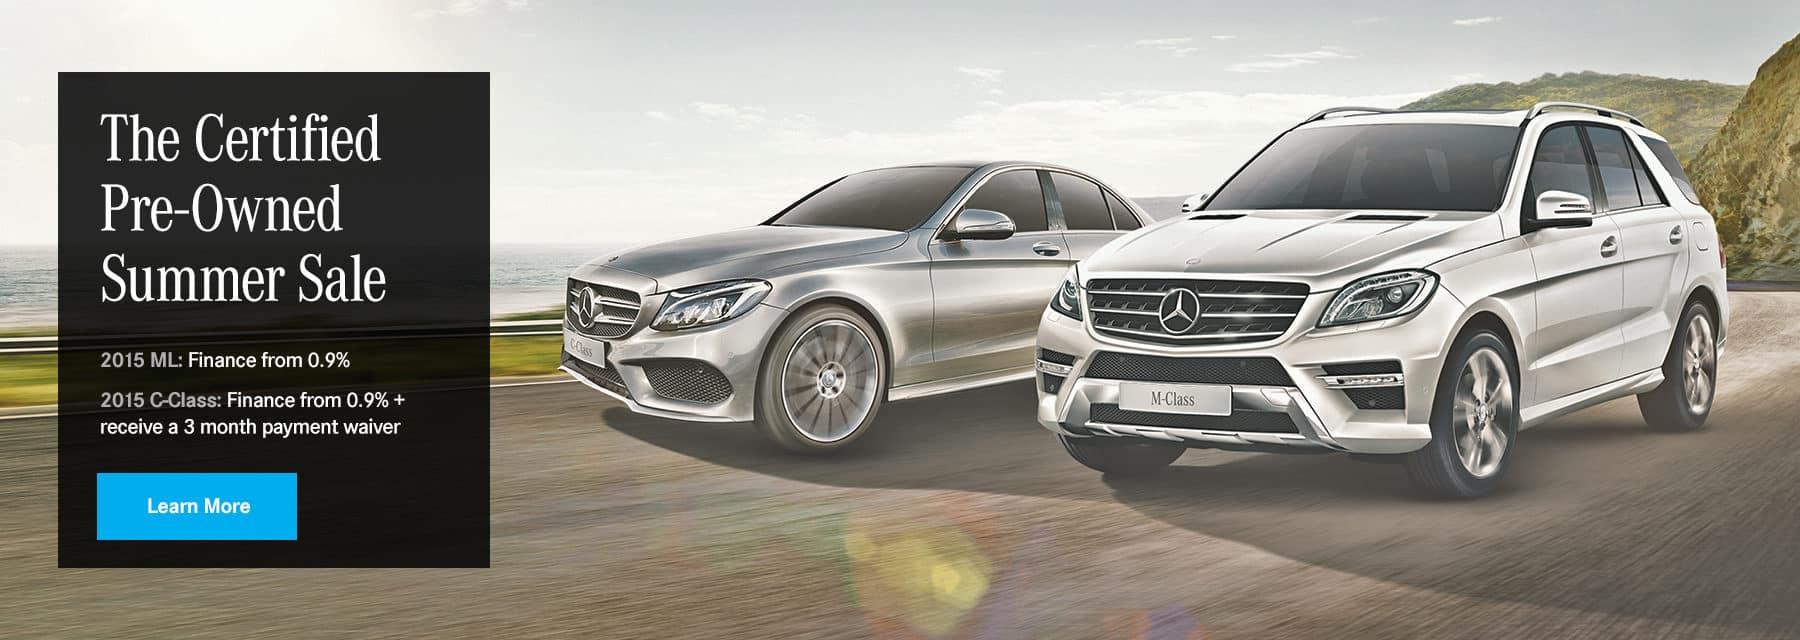 Mercedes Benz Thornhill New 2018 Mercedes Benz Cla Cla250